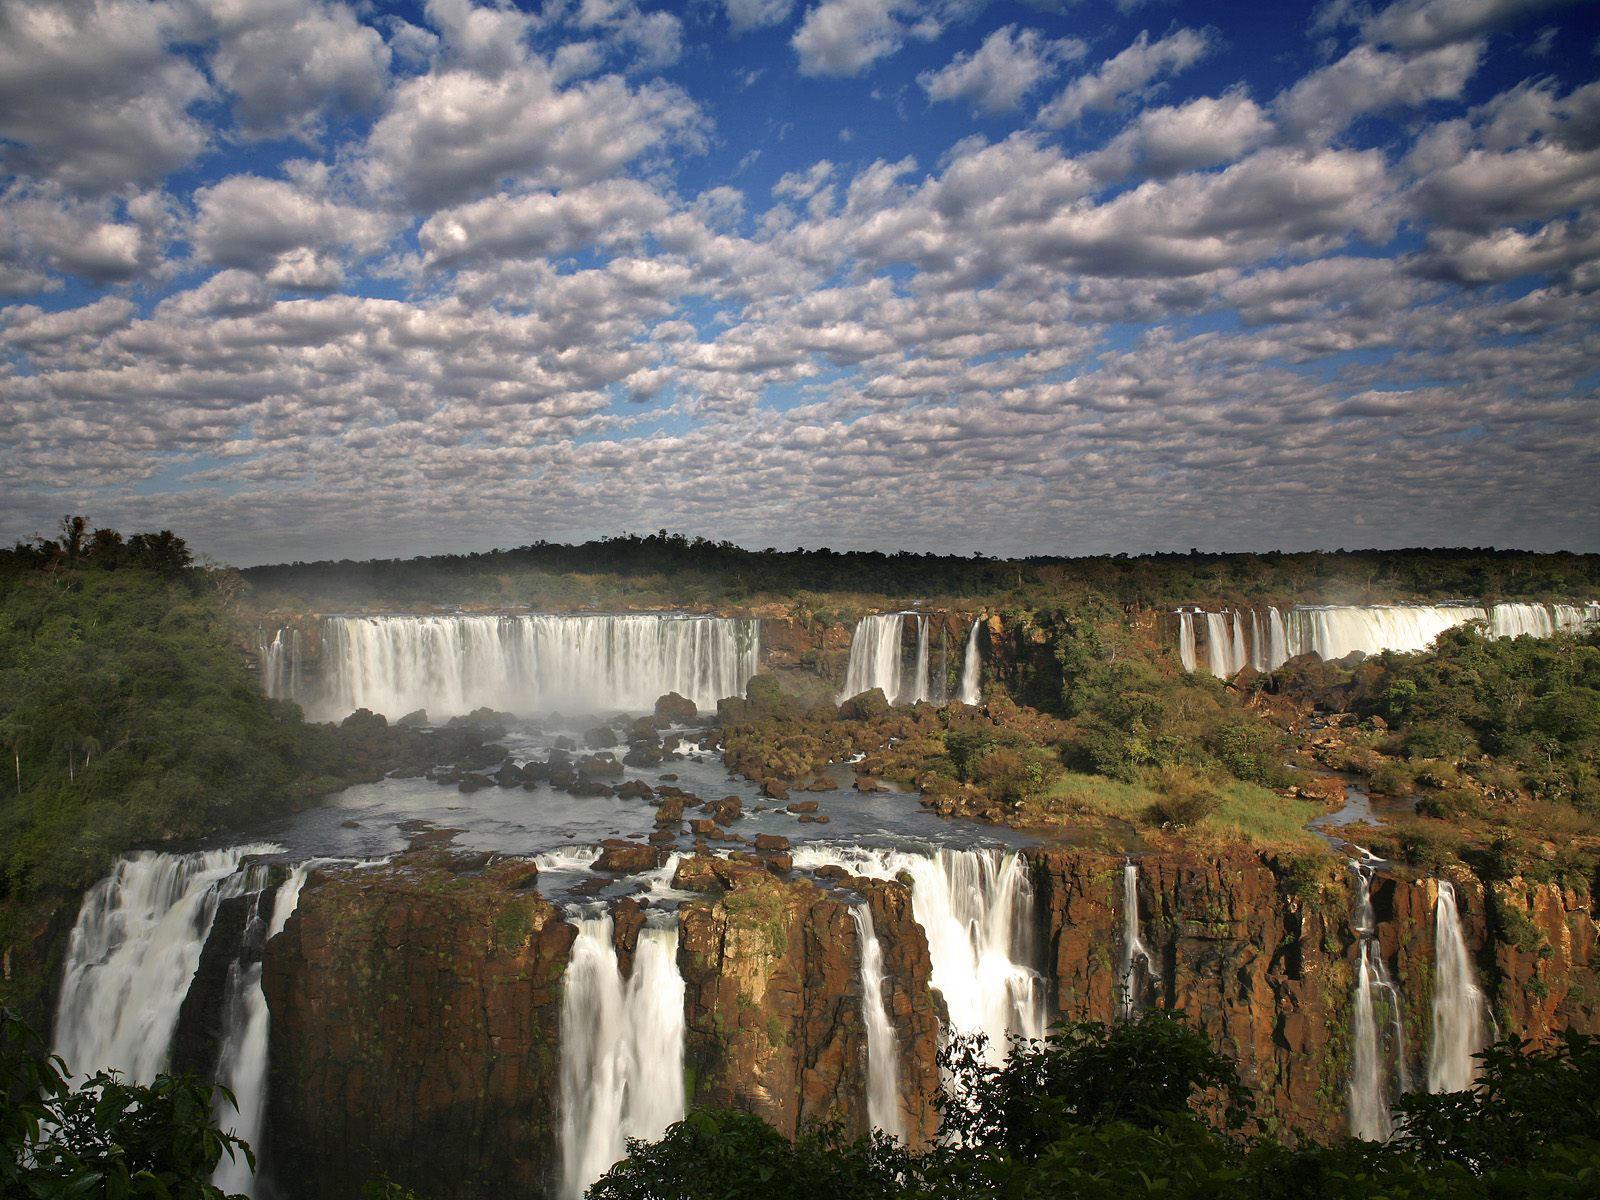 Iguazu Falls Brazil Wallpaper Iguazu Falls Brazil Argentina Border Travel And Tourism